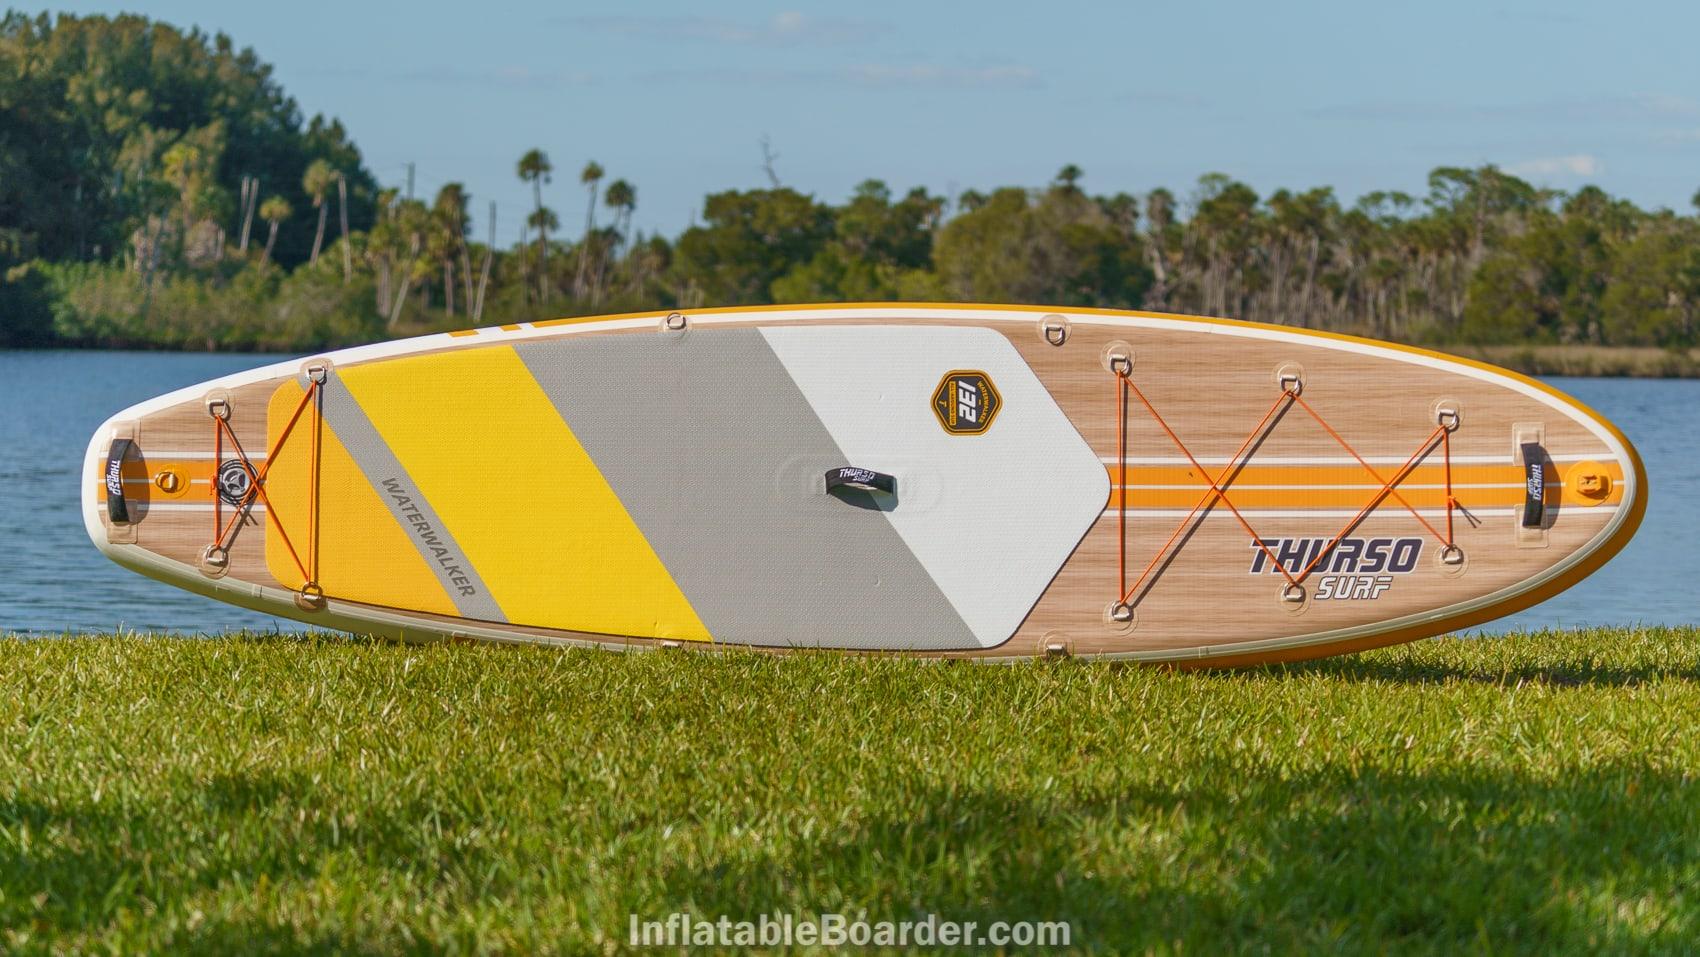 2021 Thurso Waterwalker 132 tangerine color overview